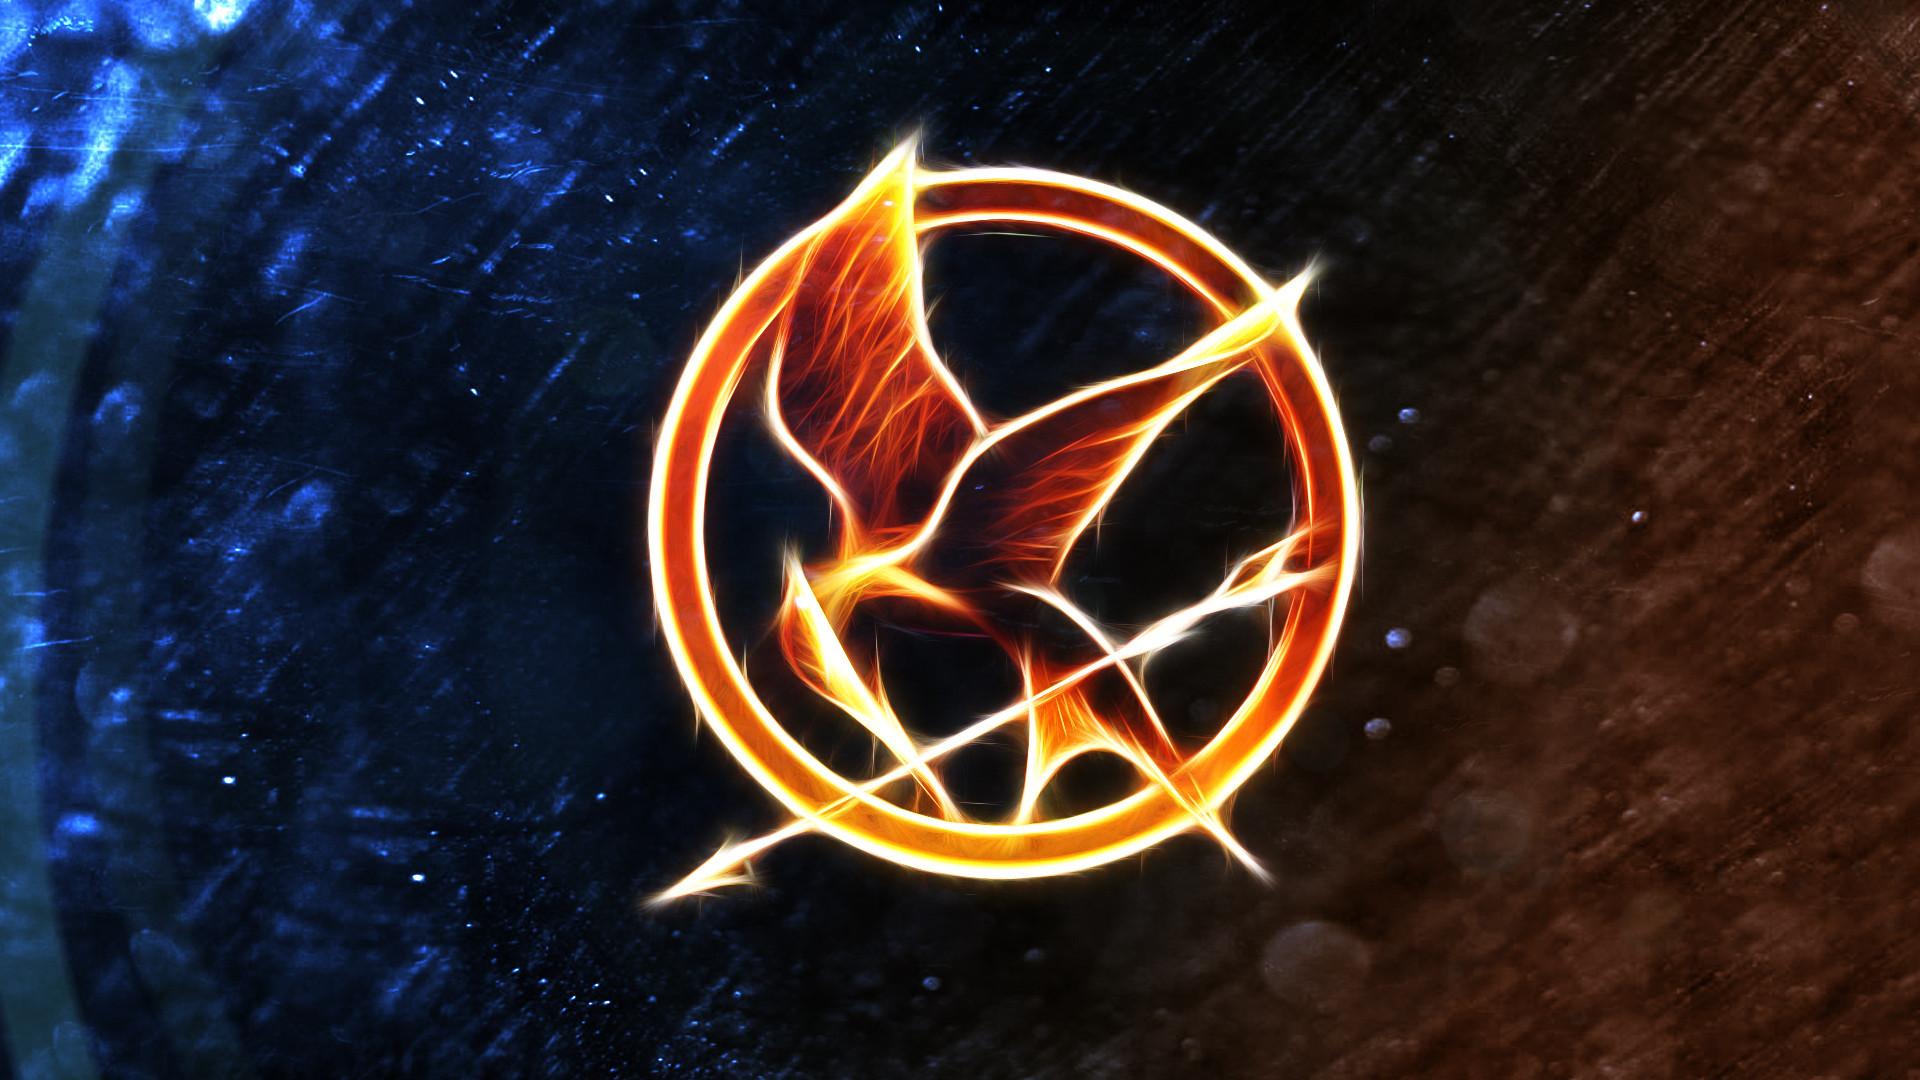 Hunger Games Mockingjay Pin wallpaper   995551 1920x1080